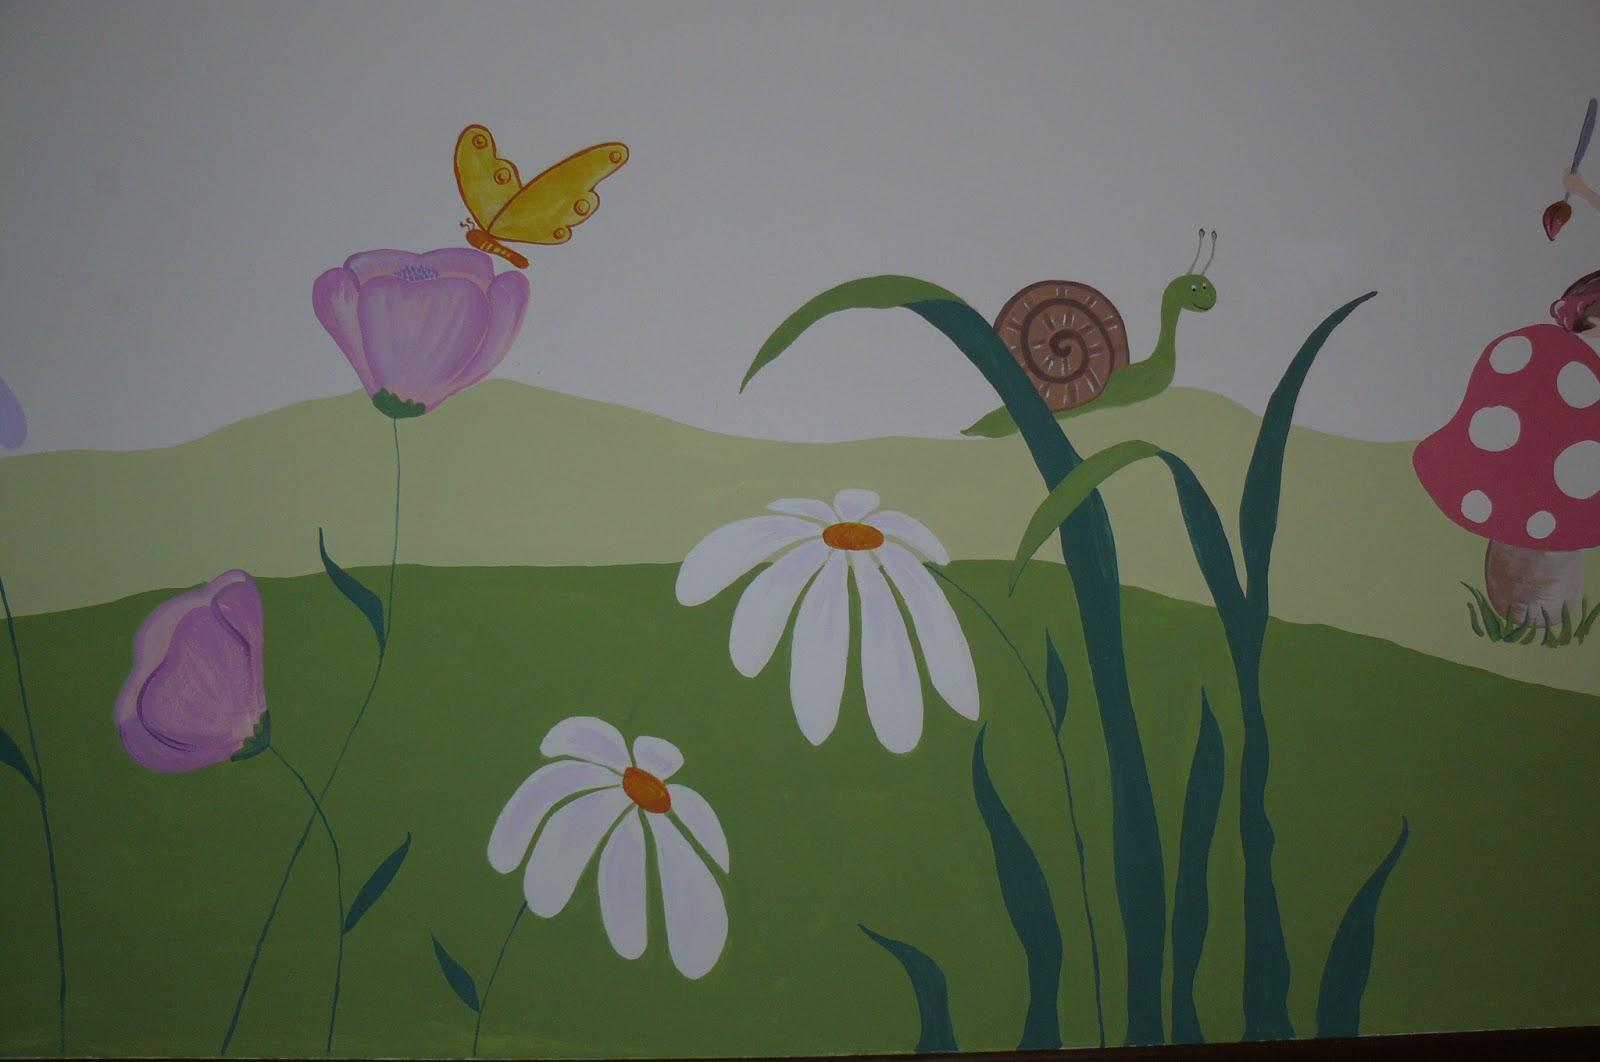 I Disegni Animati Dipinti Su Pareti Di Sisu Murales